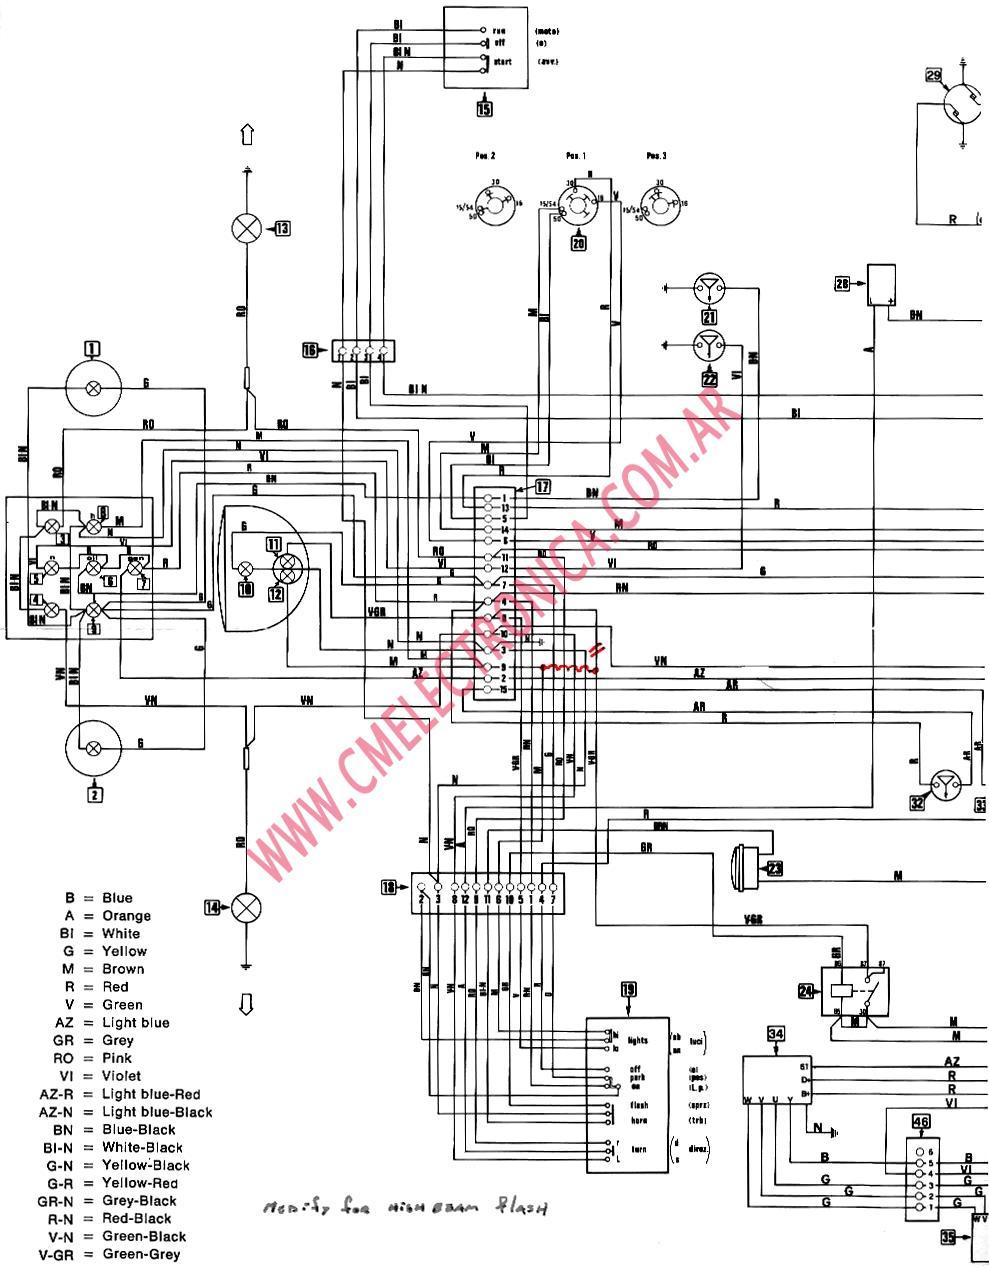 medium resolution of pin cdi wire diagram automotive wiring diagrams moto guzzi flasher pin cdi wire diagram moto guzzi